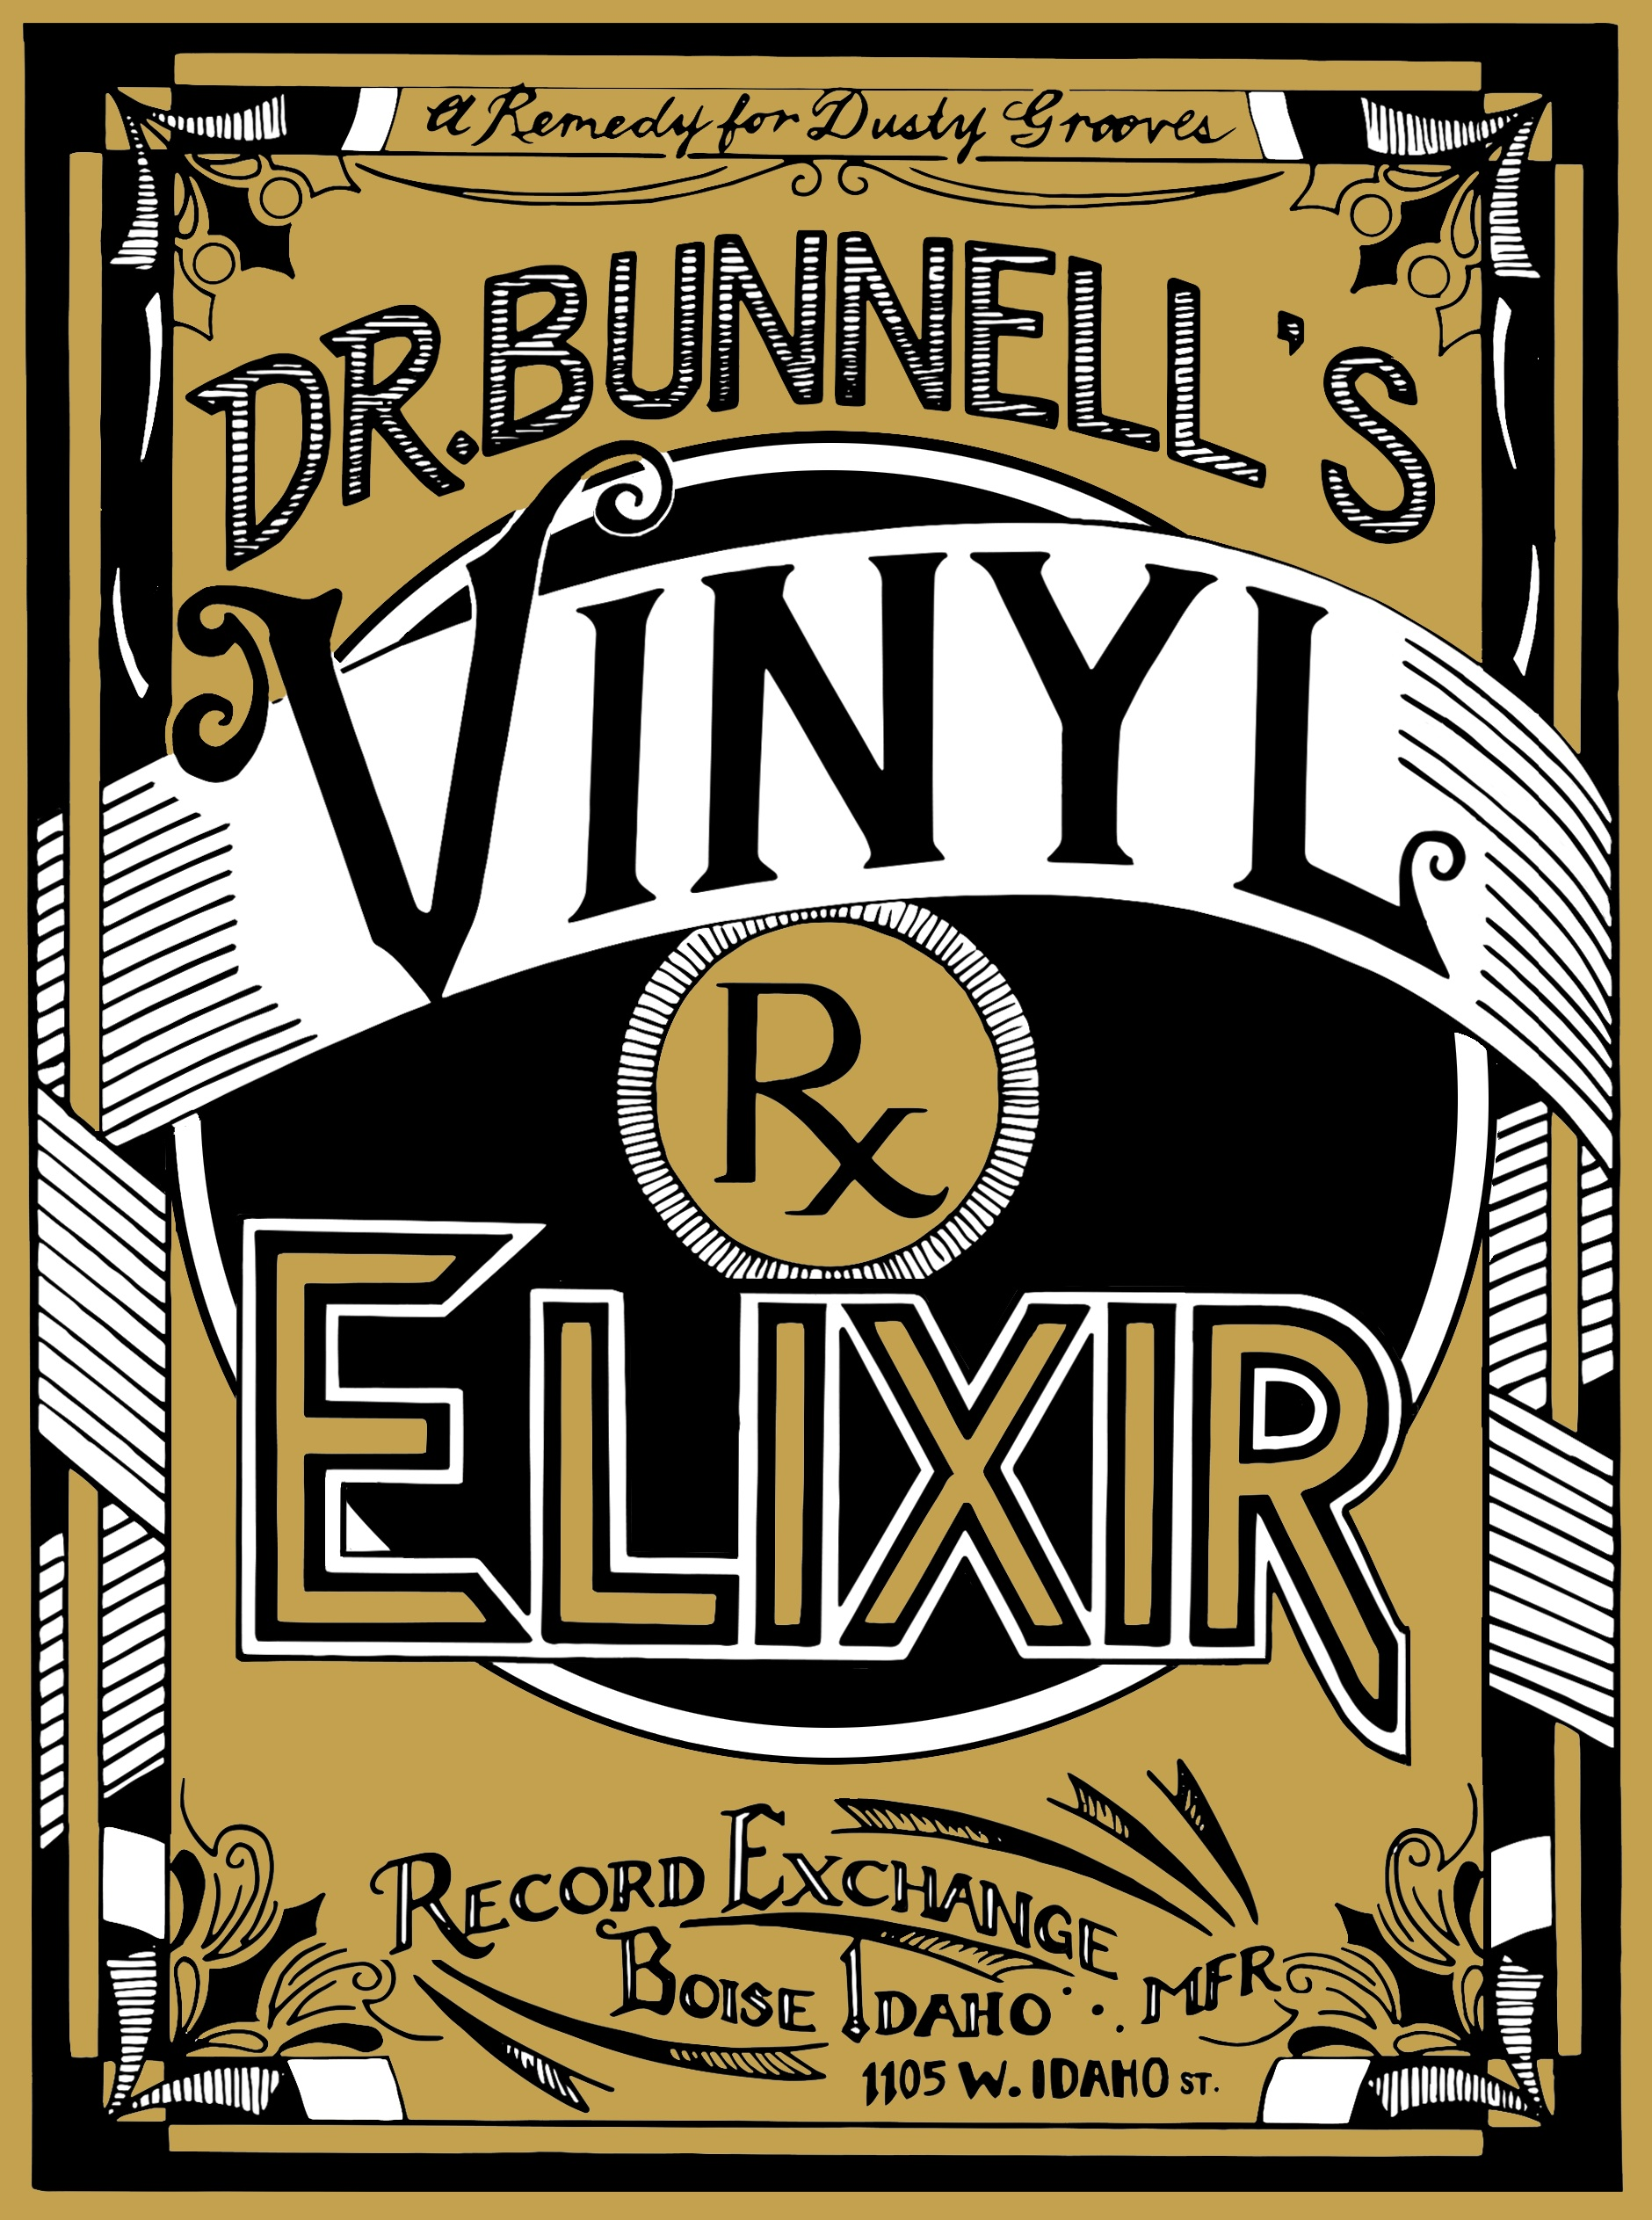 Dr. Bunnell's Vinyl Elixir